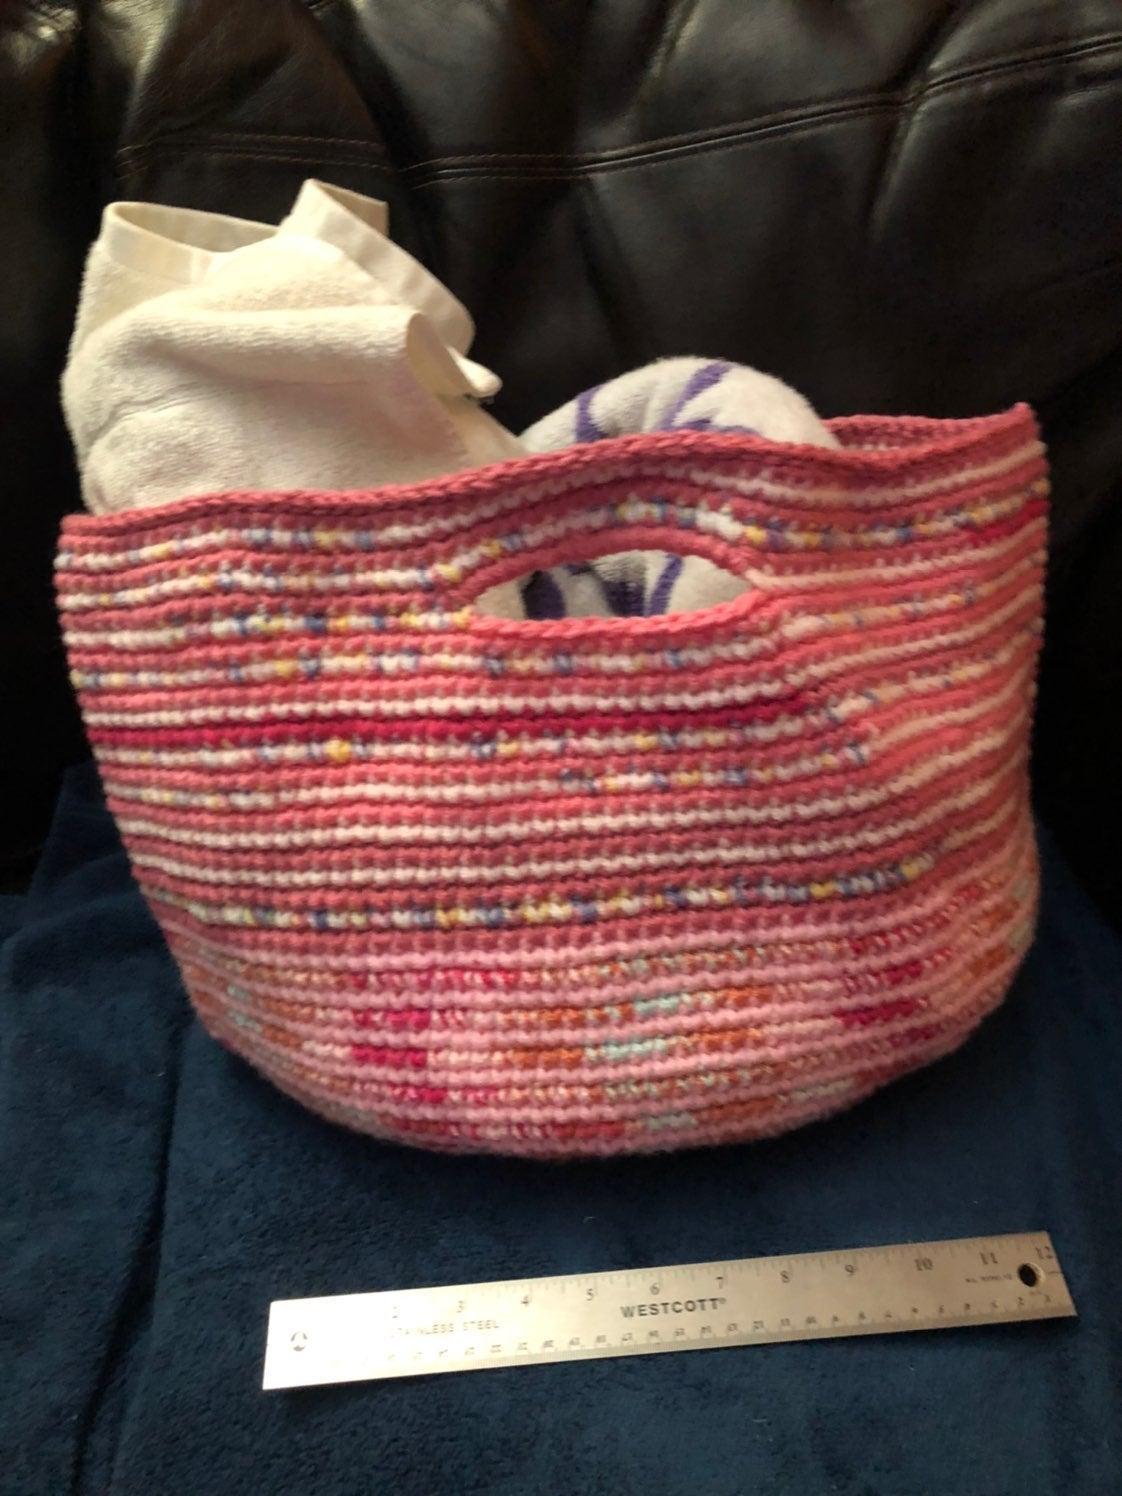 Large pink handmade crochet basket